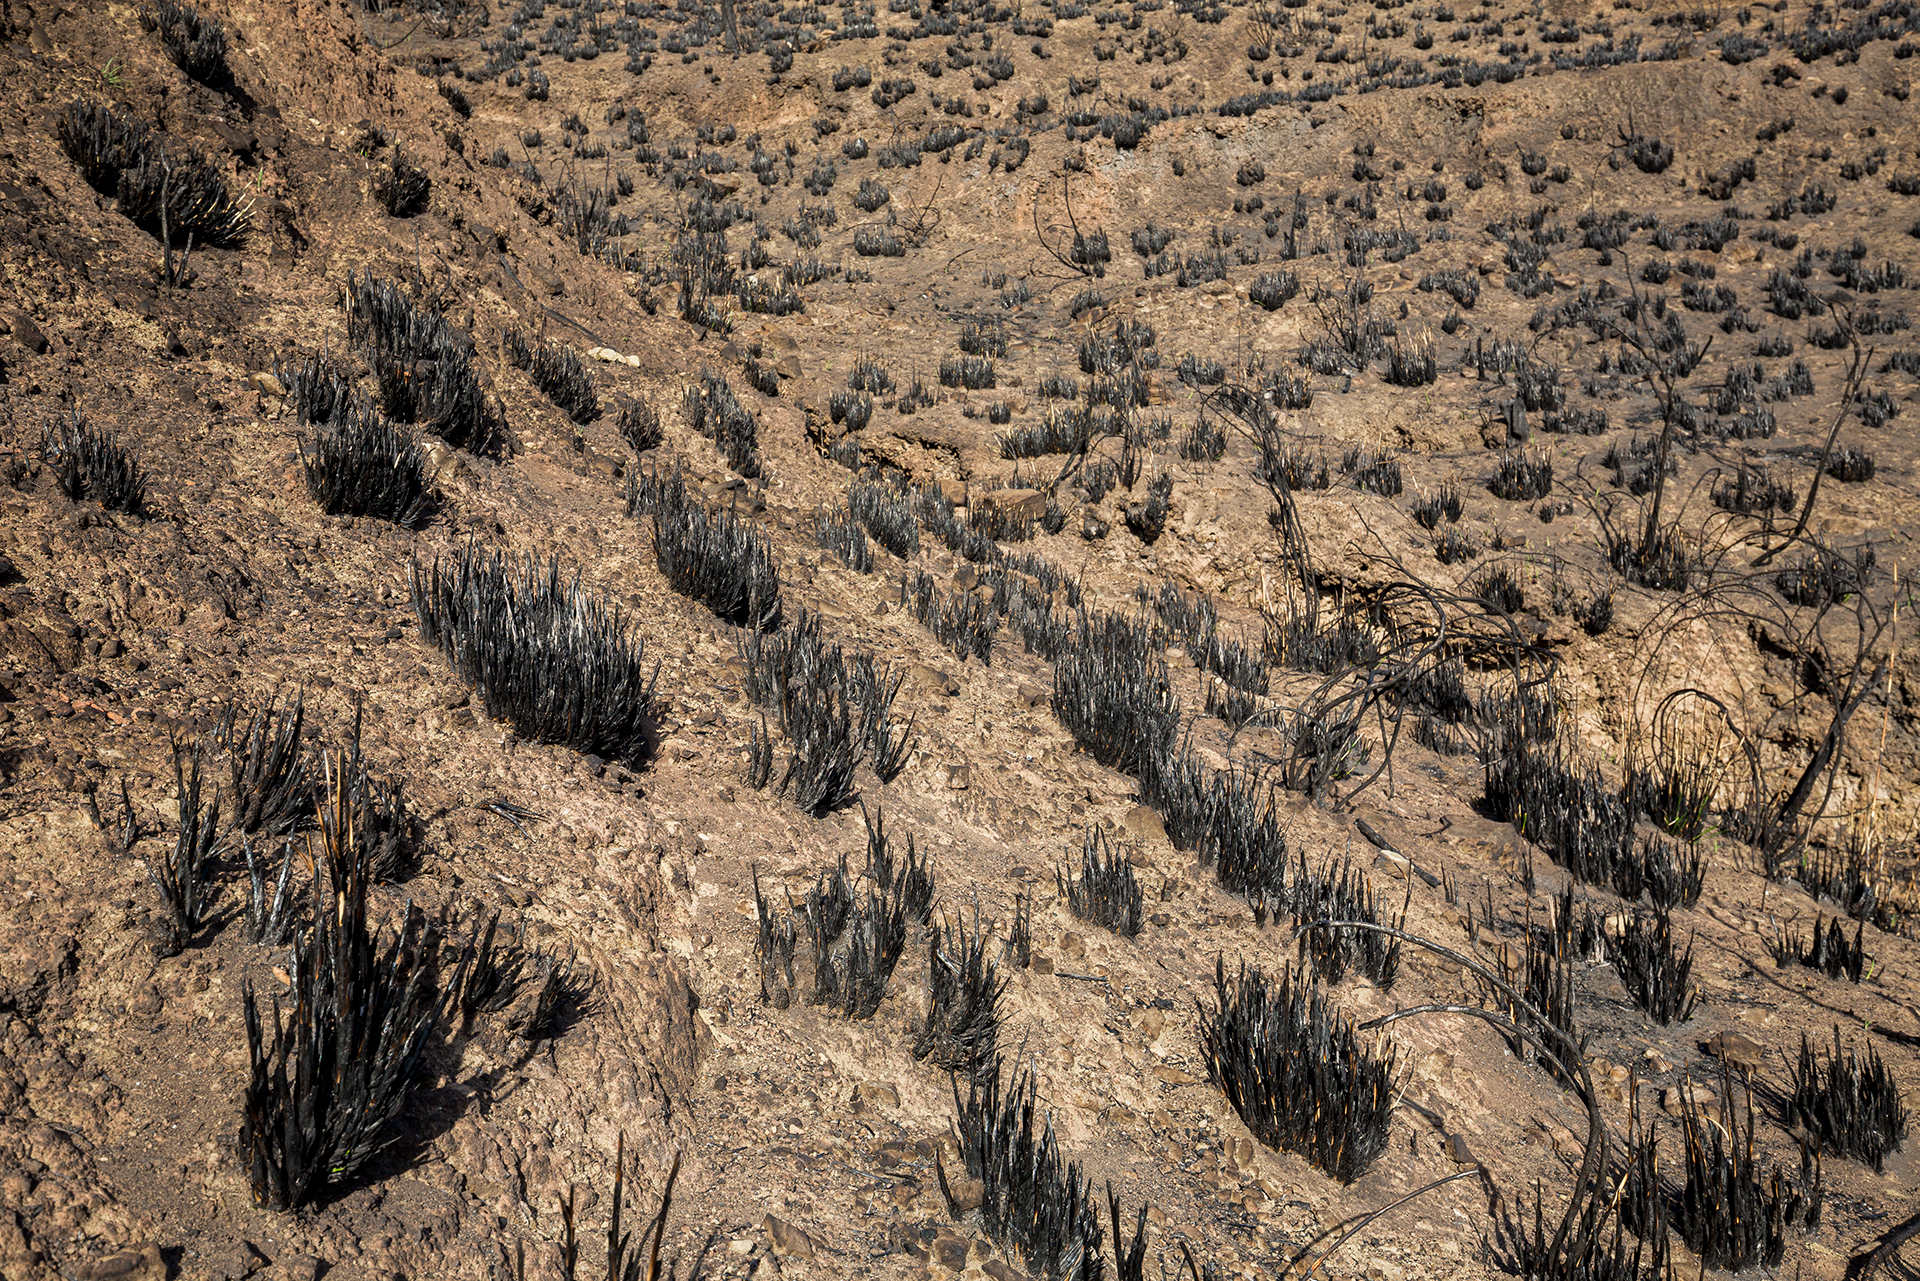 Prateria mediterranea ridotta in cenere, Madonie (Pa) 2020